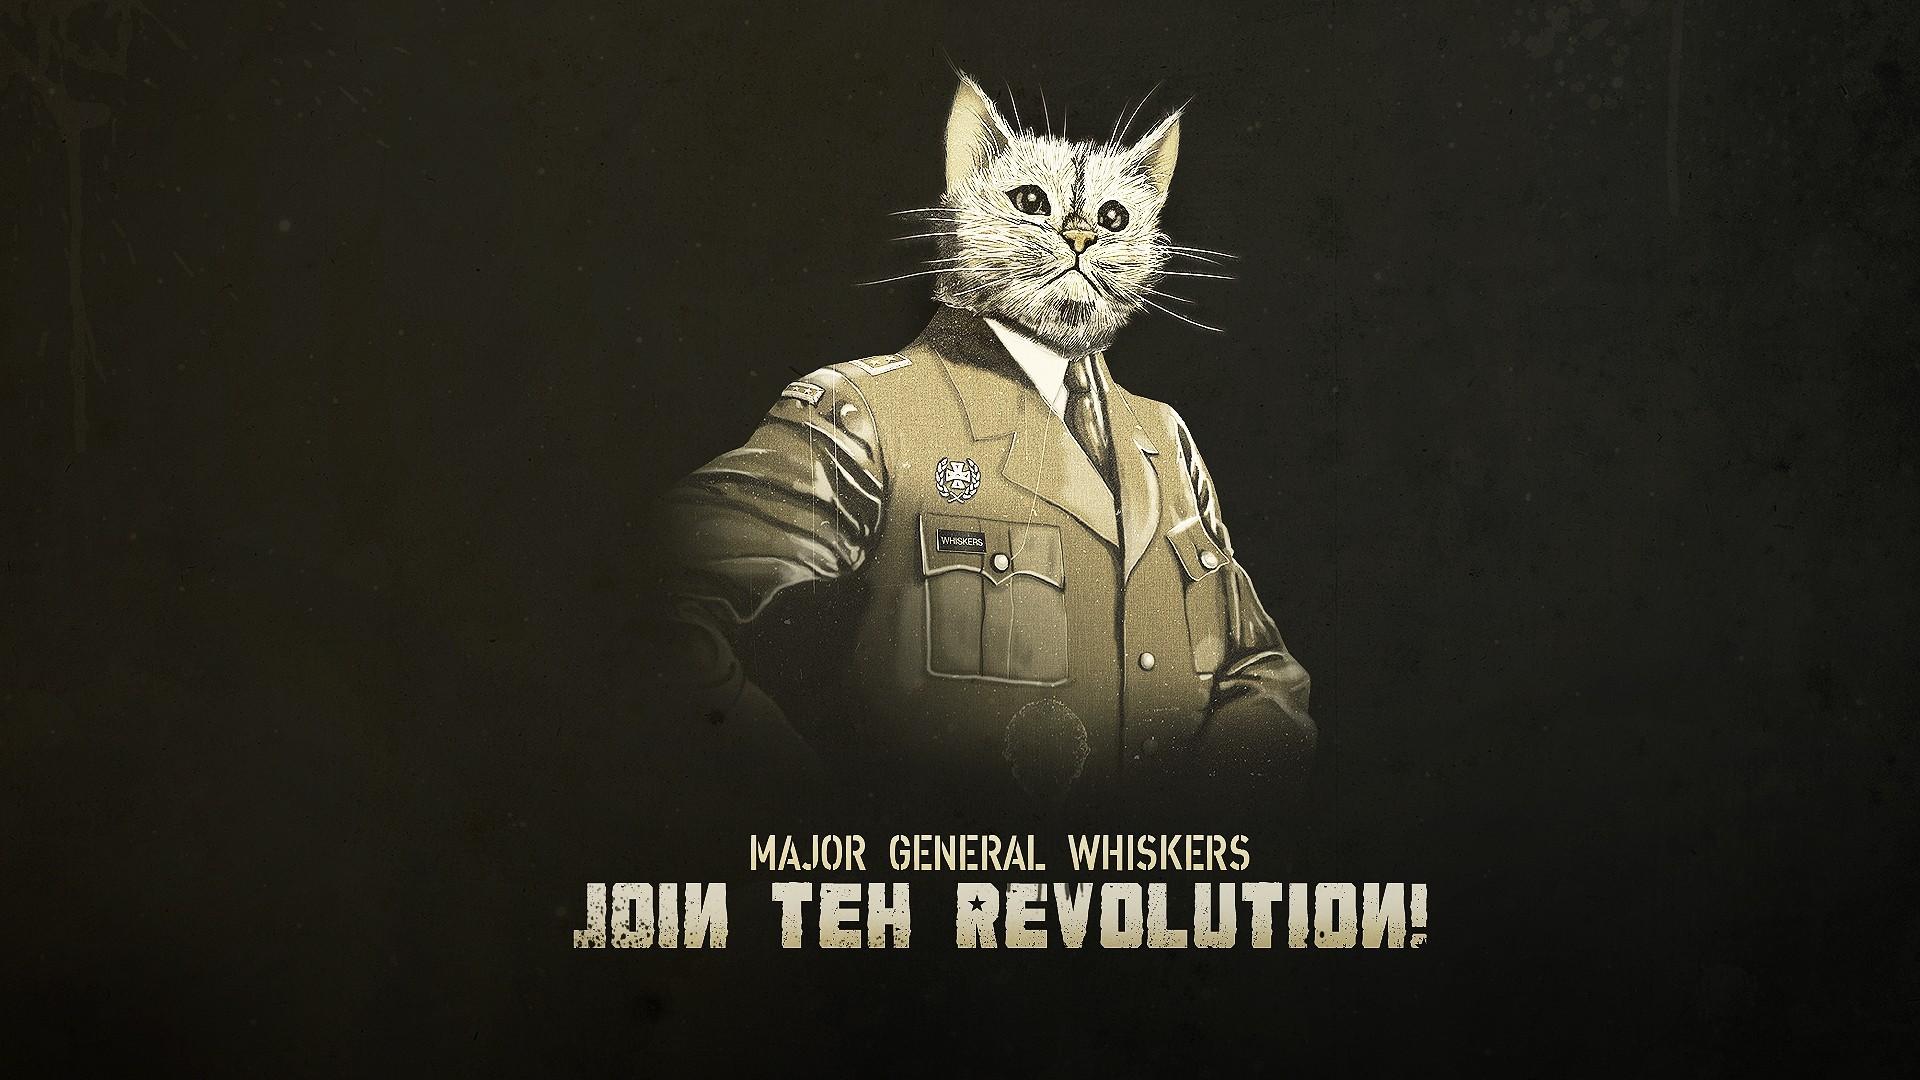 wallpaper cat artwork typography uniform darkness 1920x1080 diams1988 227898 hd wallpapers wallhere wallhere